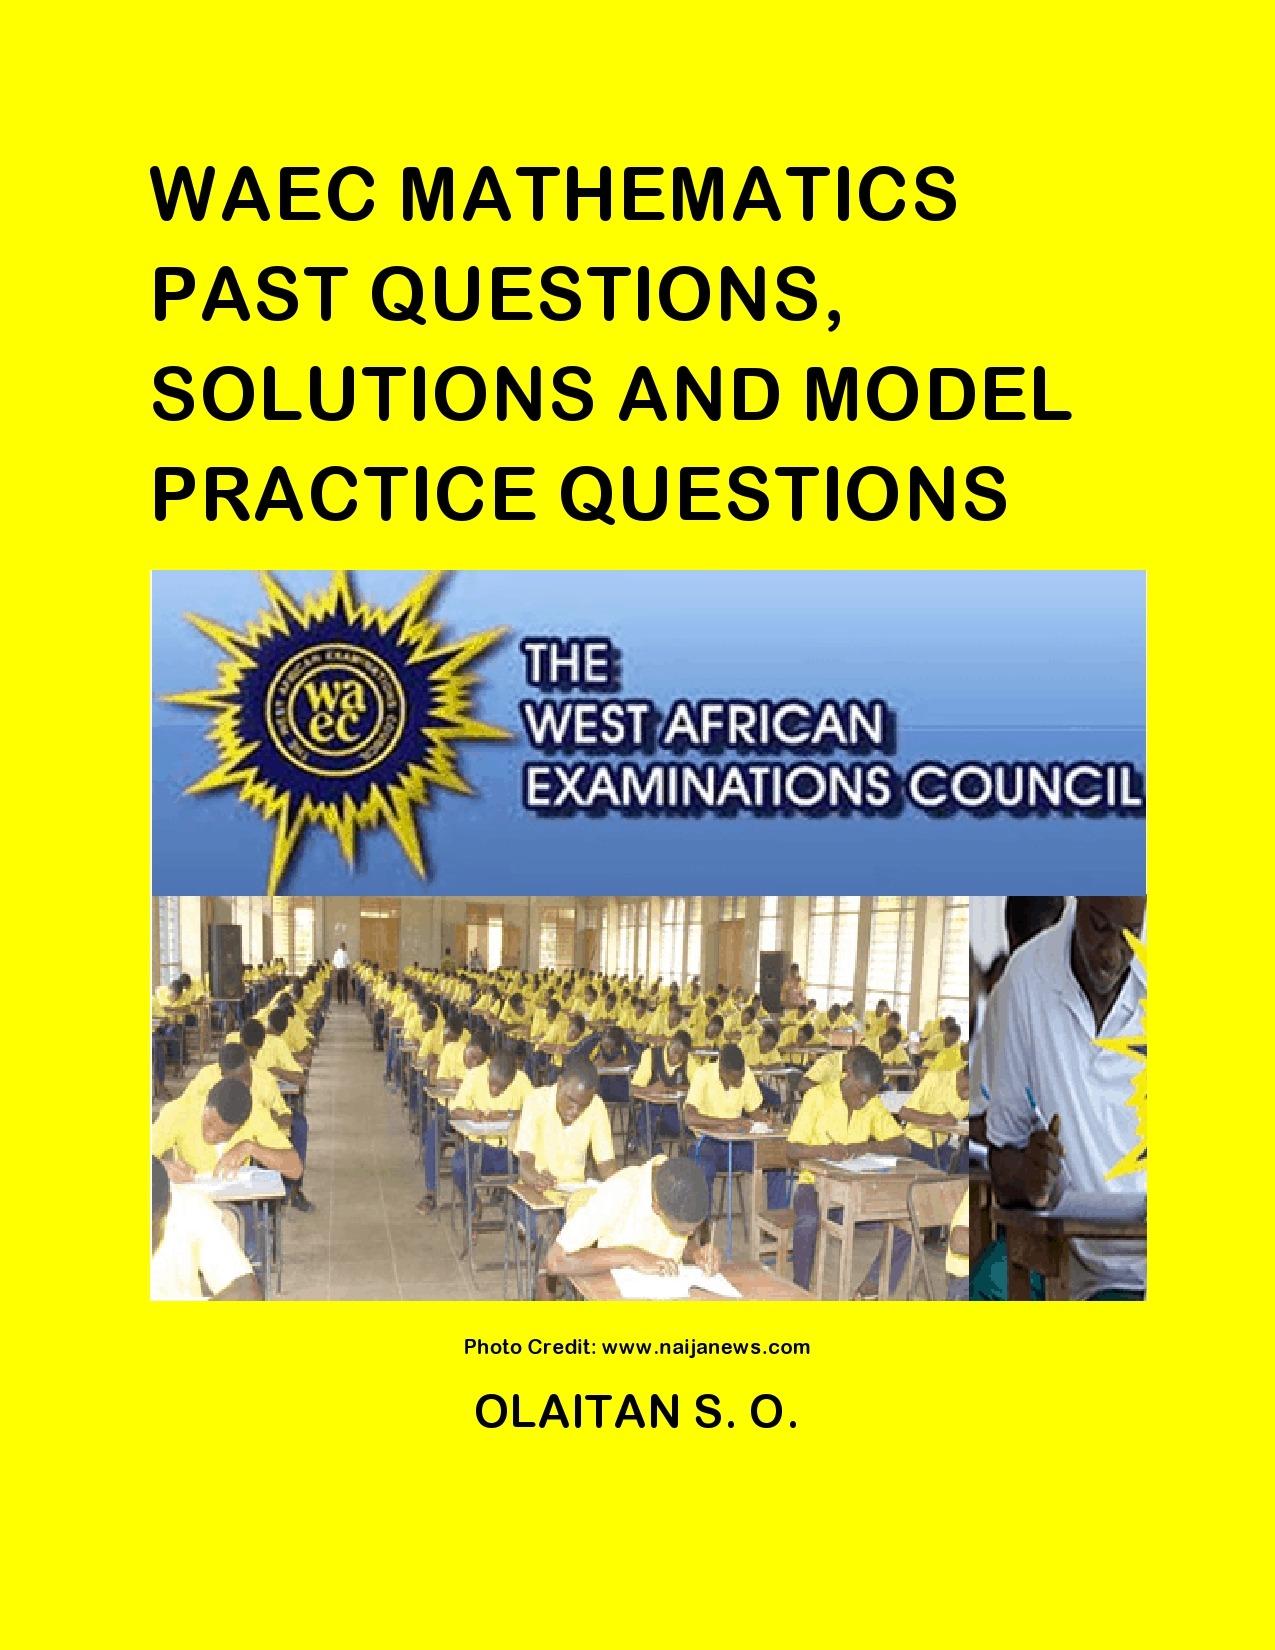 WAEC MATHEMATICS PAST QUESTIONS, SOLUTIONS AND MODEL PRACTICE QUE